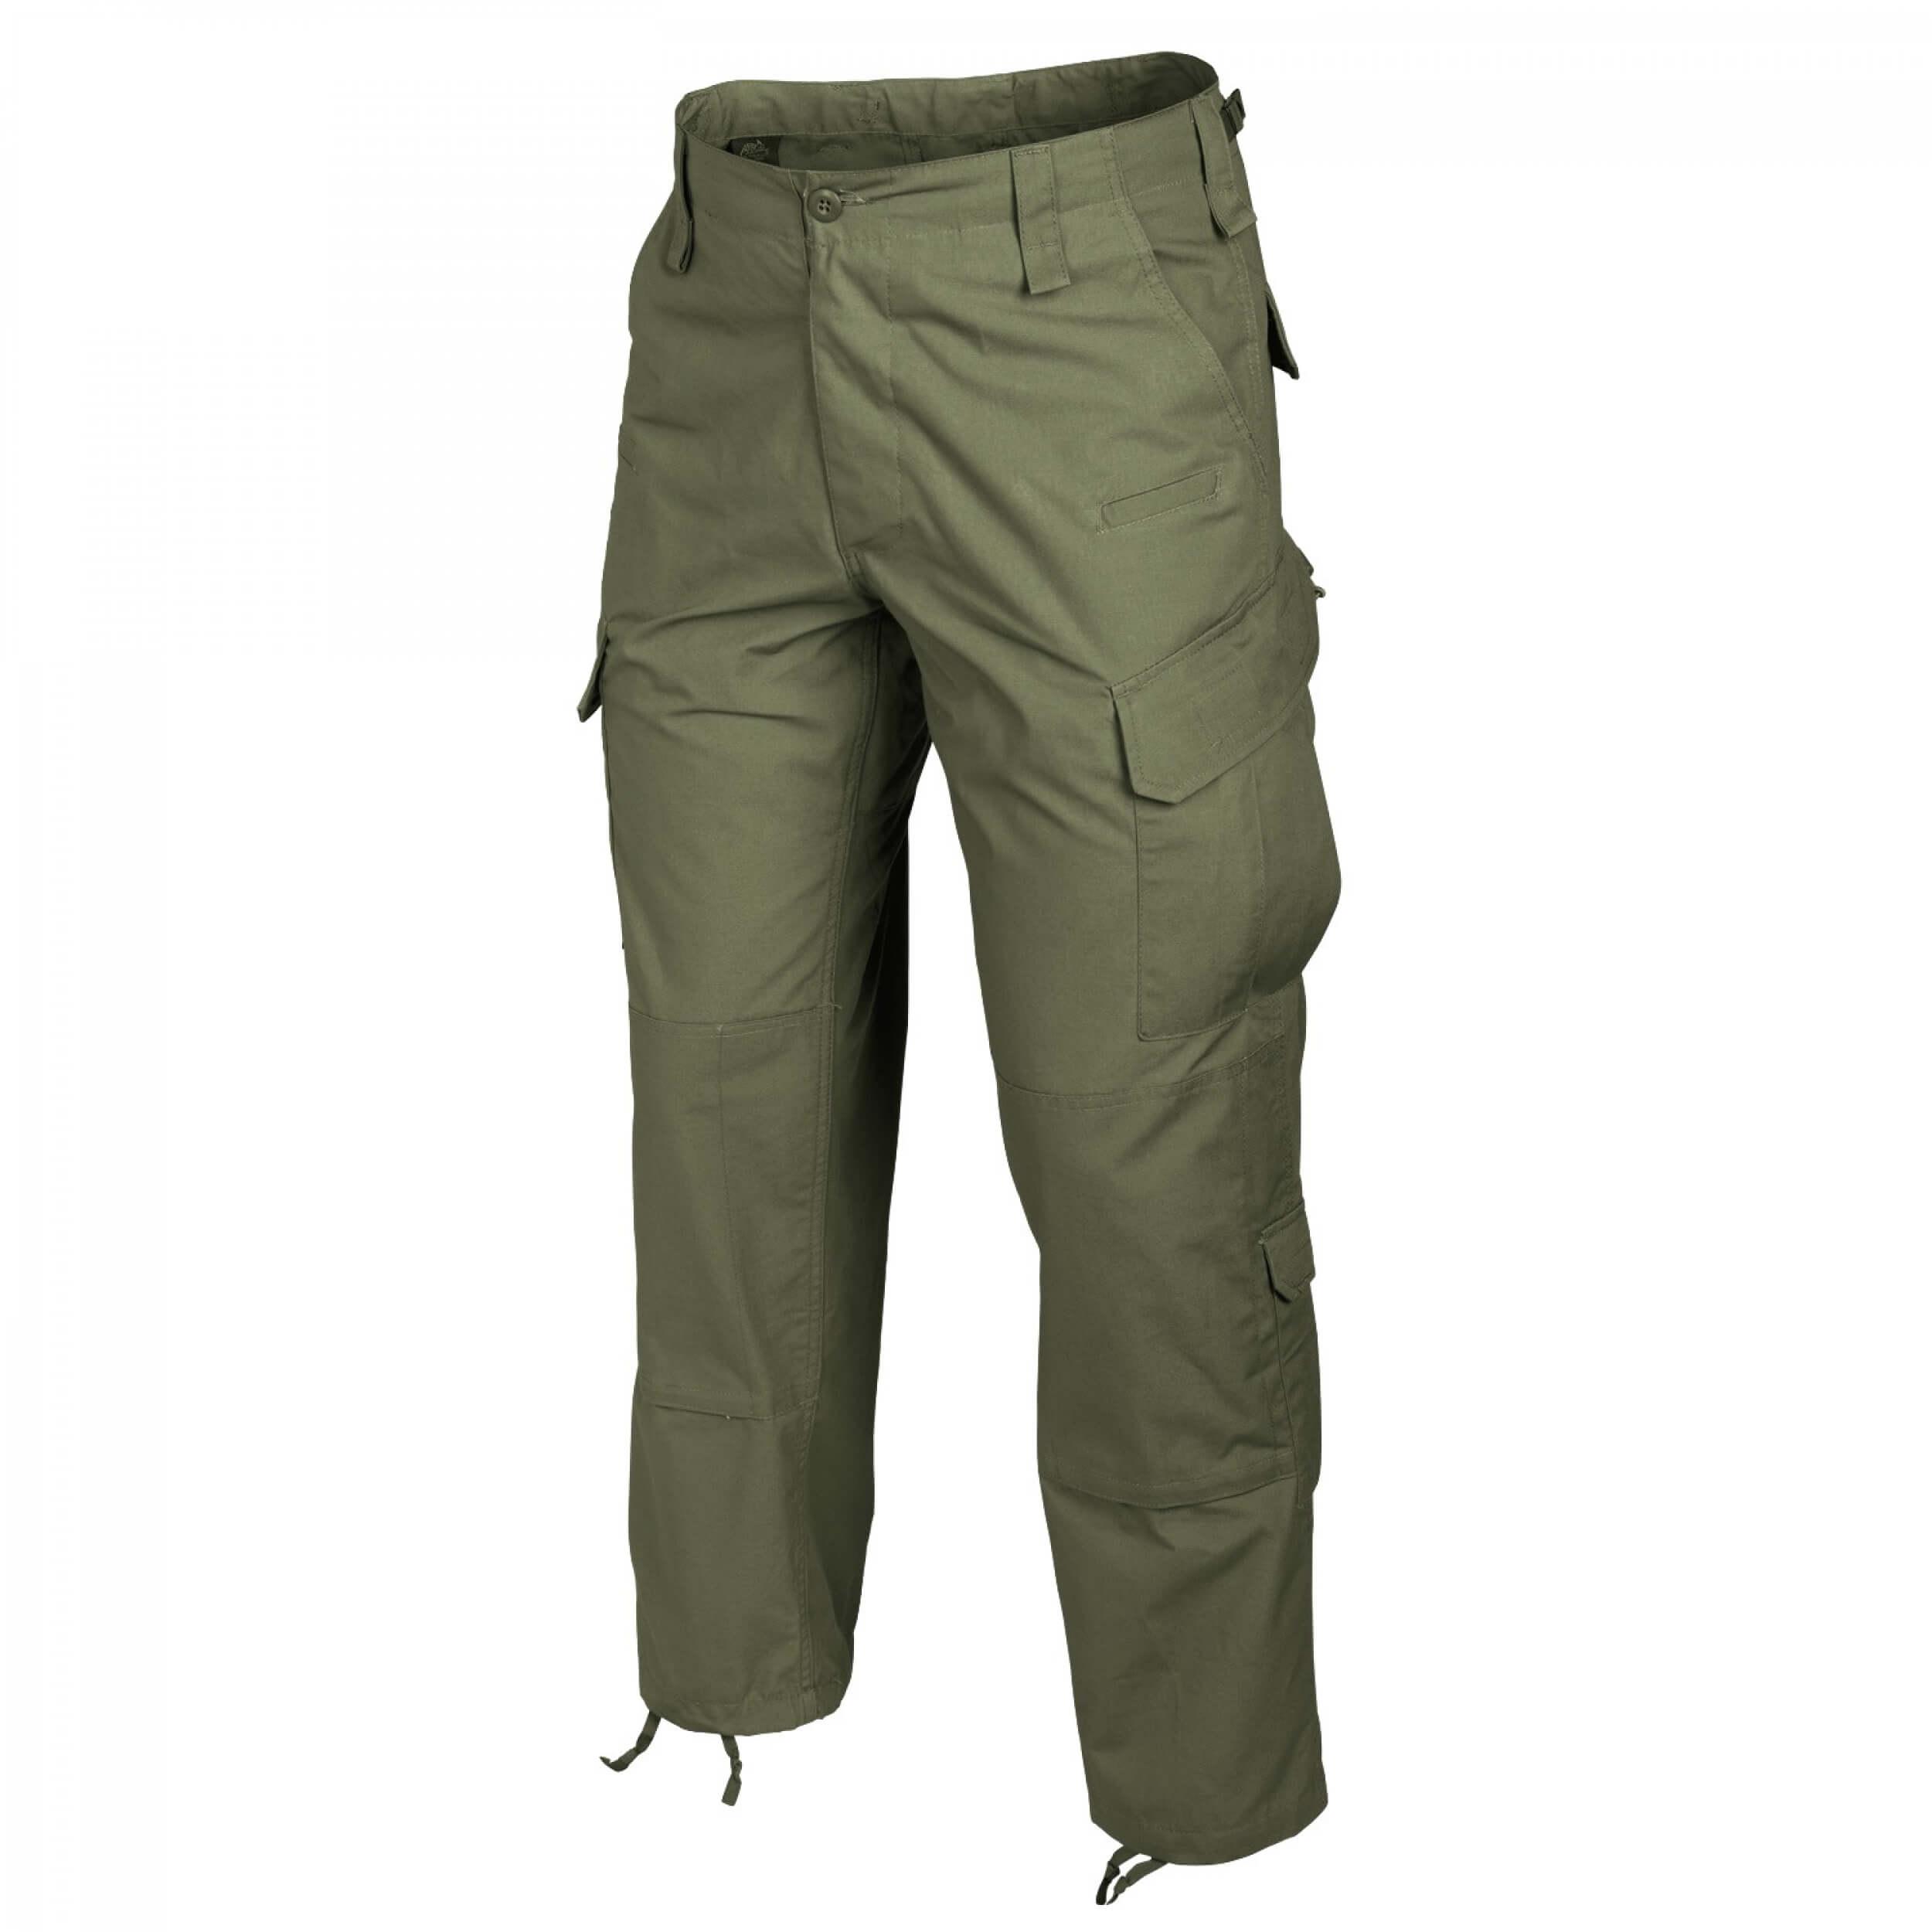 Helikon-Tex CPU Hose Combat Patrol Uniform Ripstop Olive Green